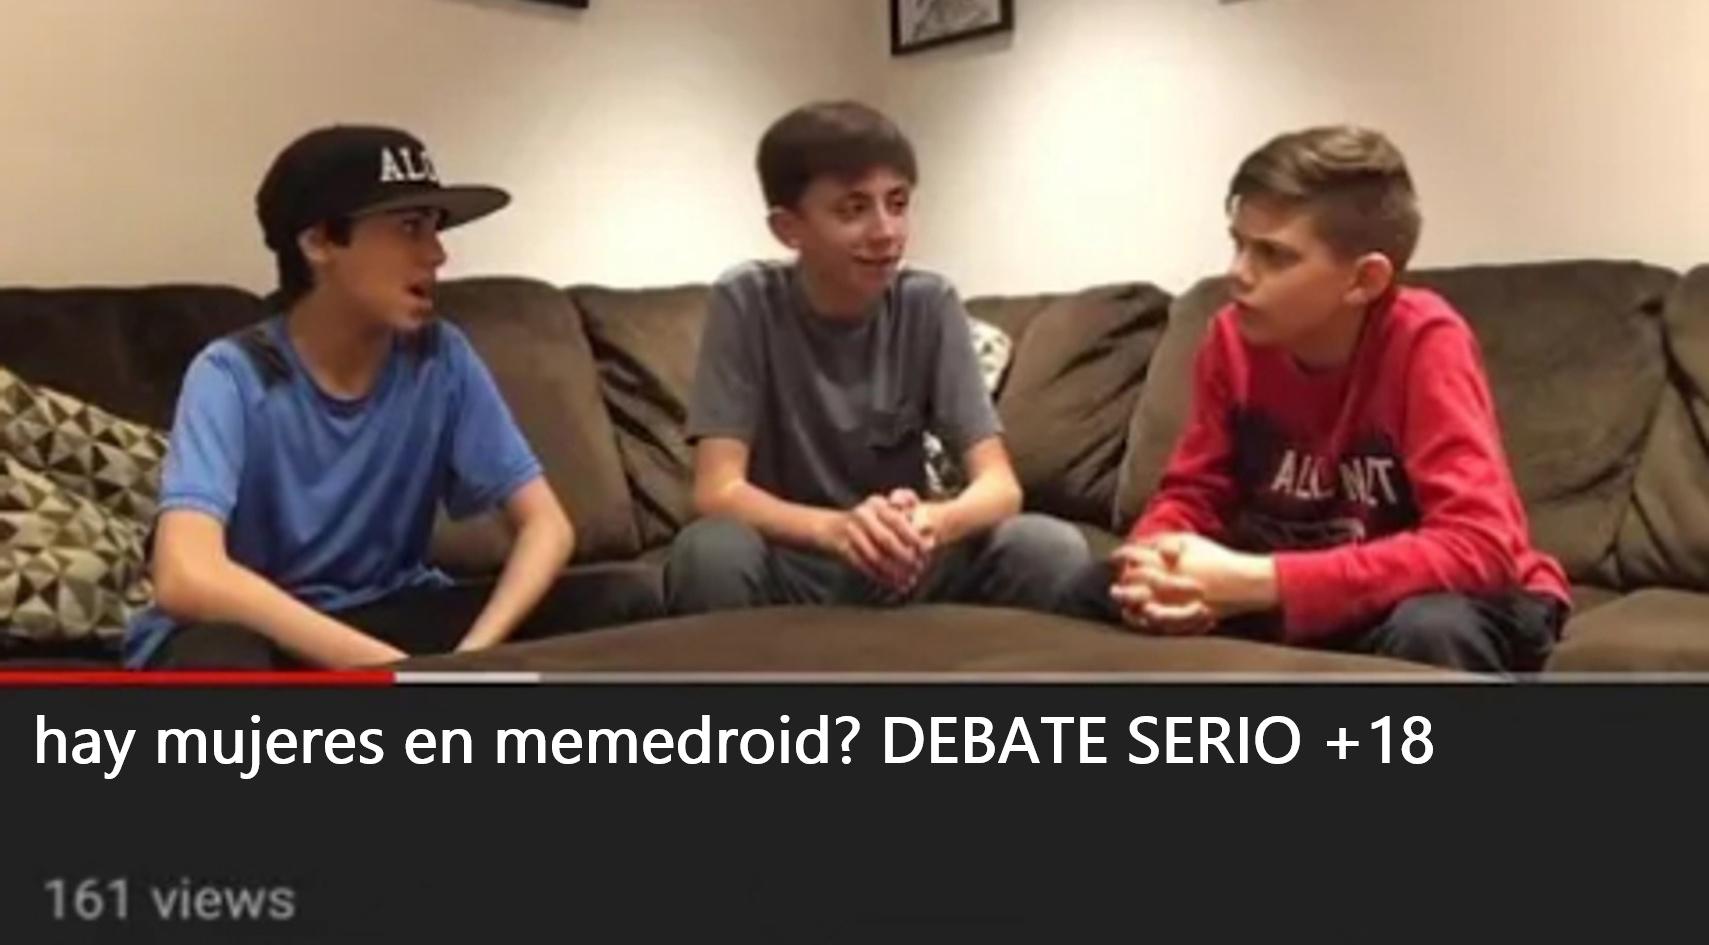 HABRA? - meme